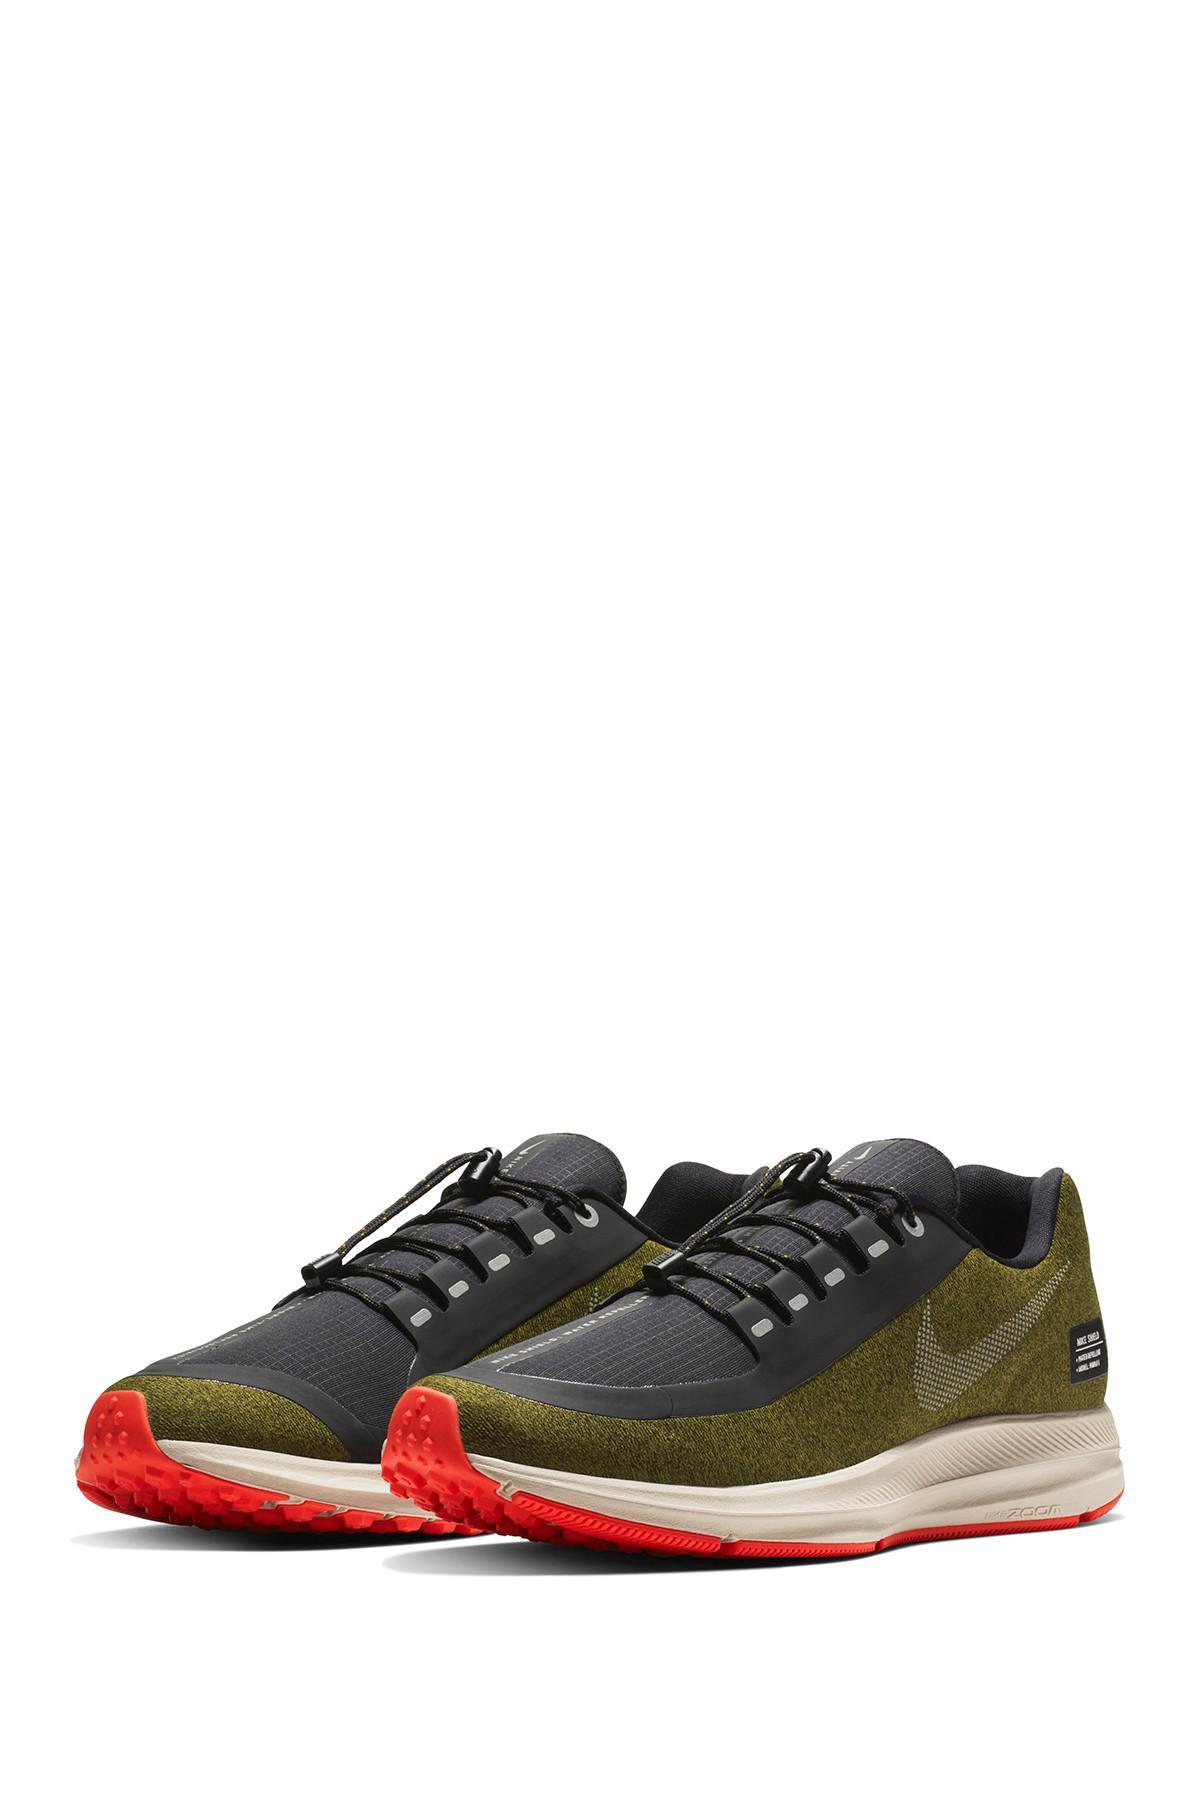 2aad8898b8bb Nike - Multicolor Zoom Winflo 5 Shield Lightweight Running Shoe for Men -  Lyst. View fullscreen